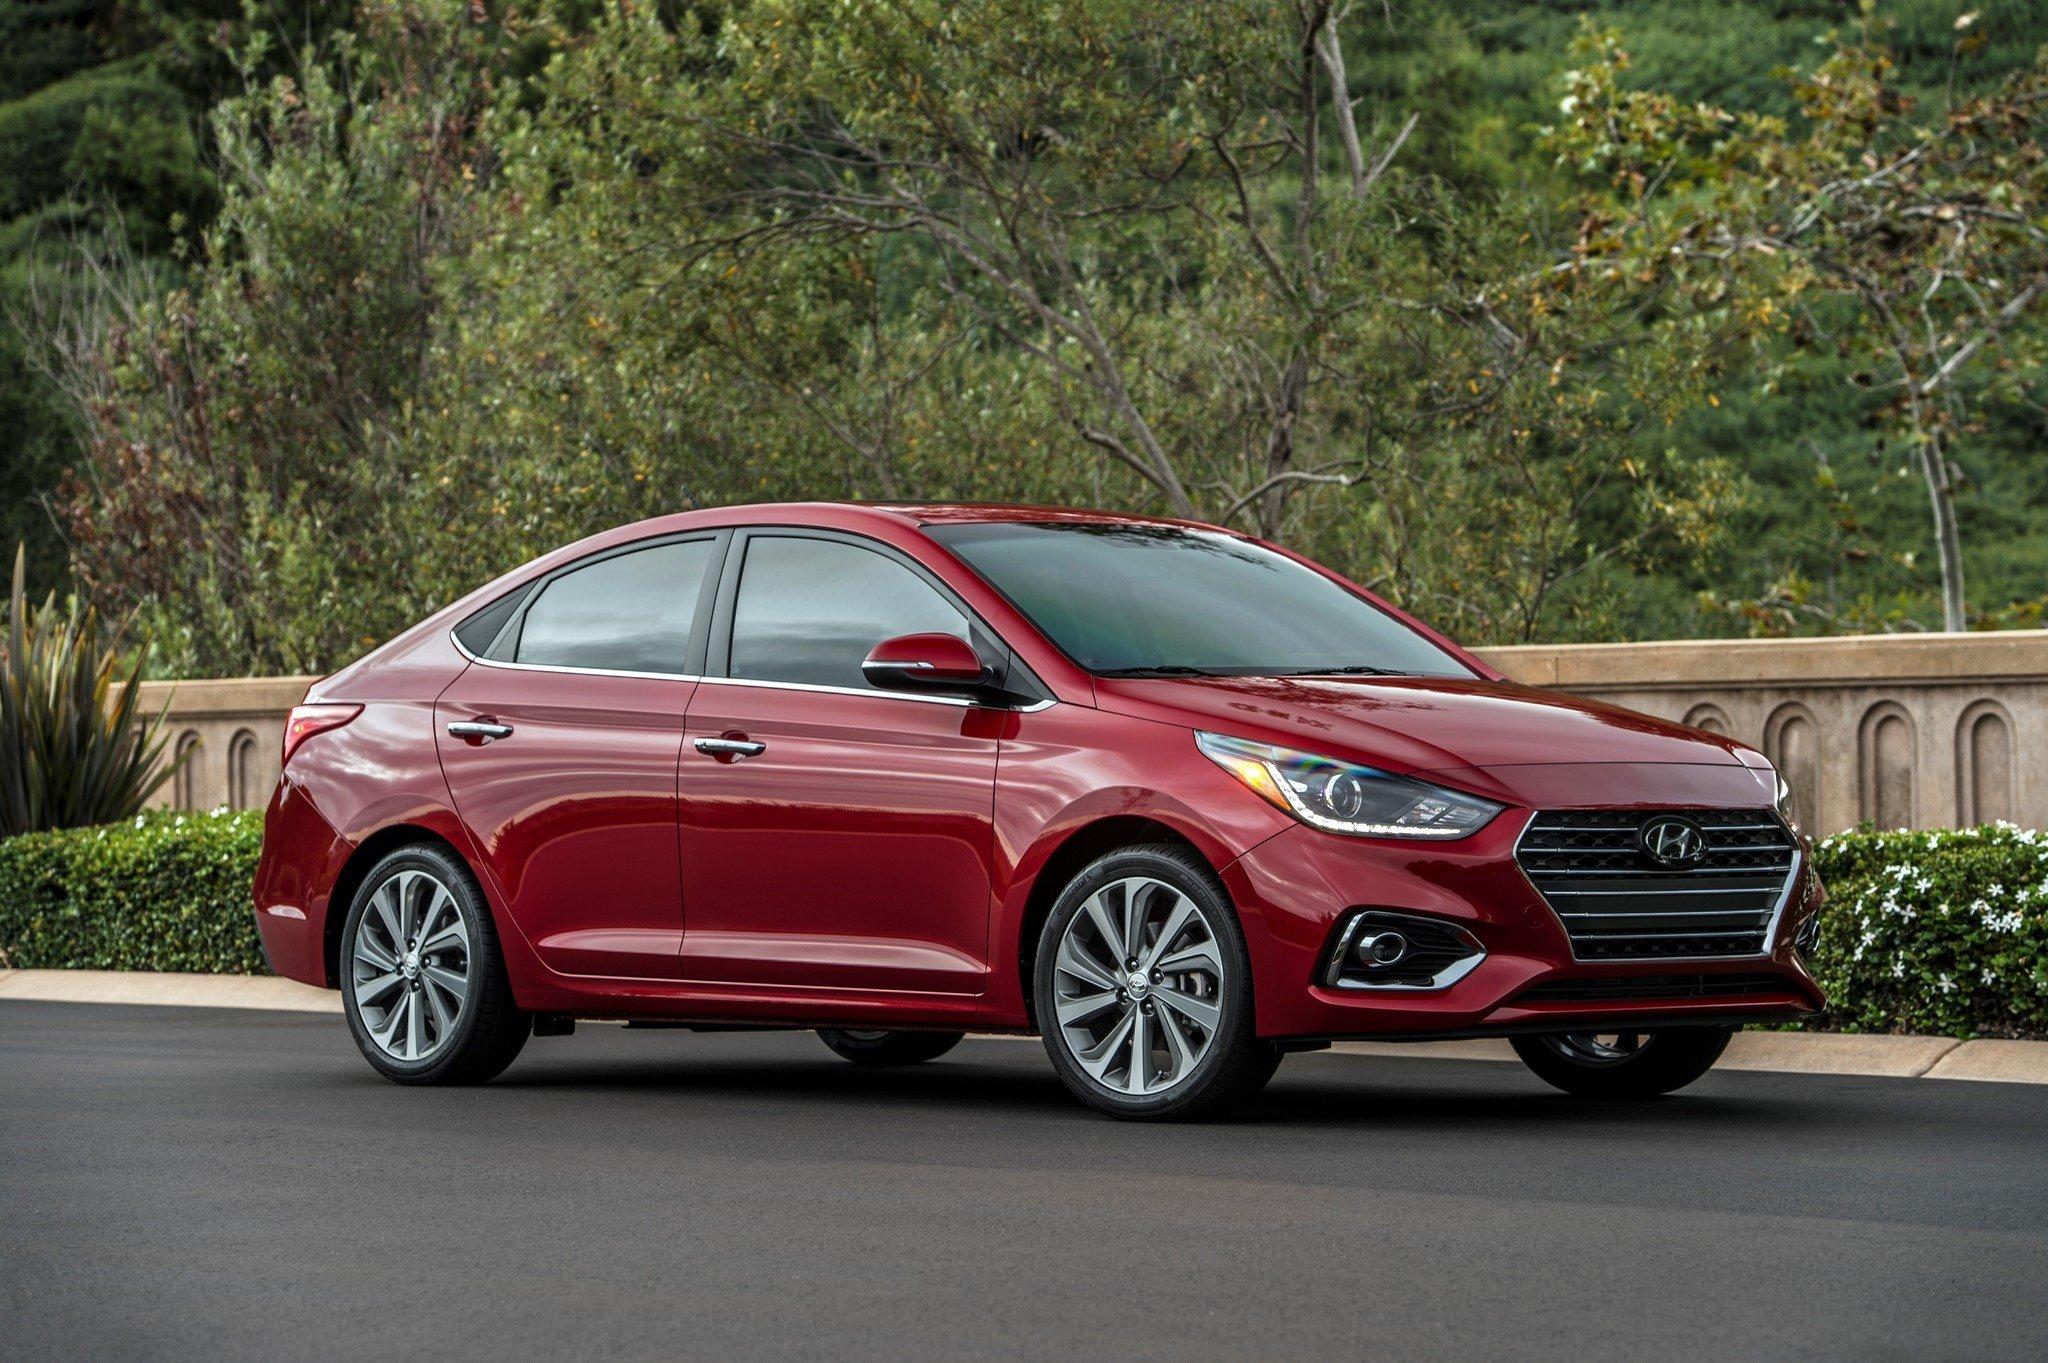 2014 hyundai accent gls fwd sedan. Hyundai's 2018 Accent enters its fifth generation